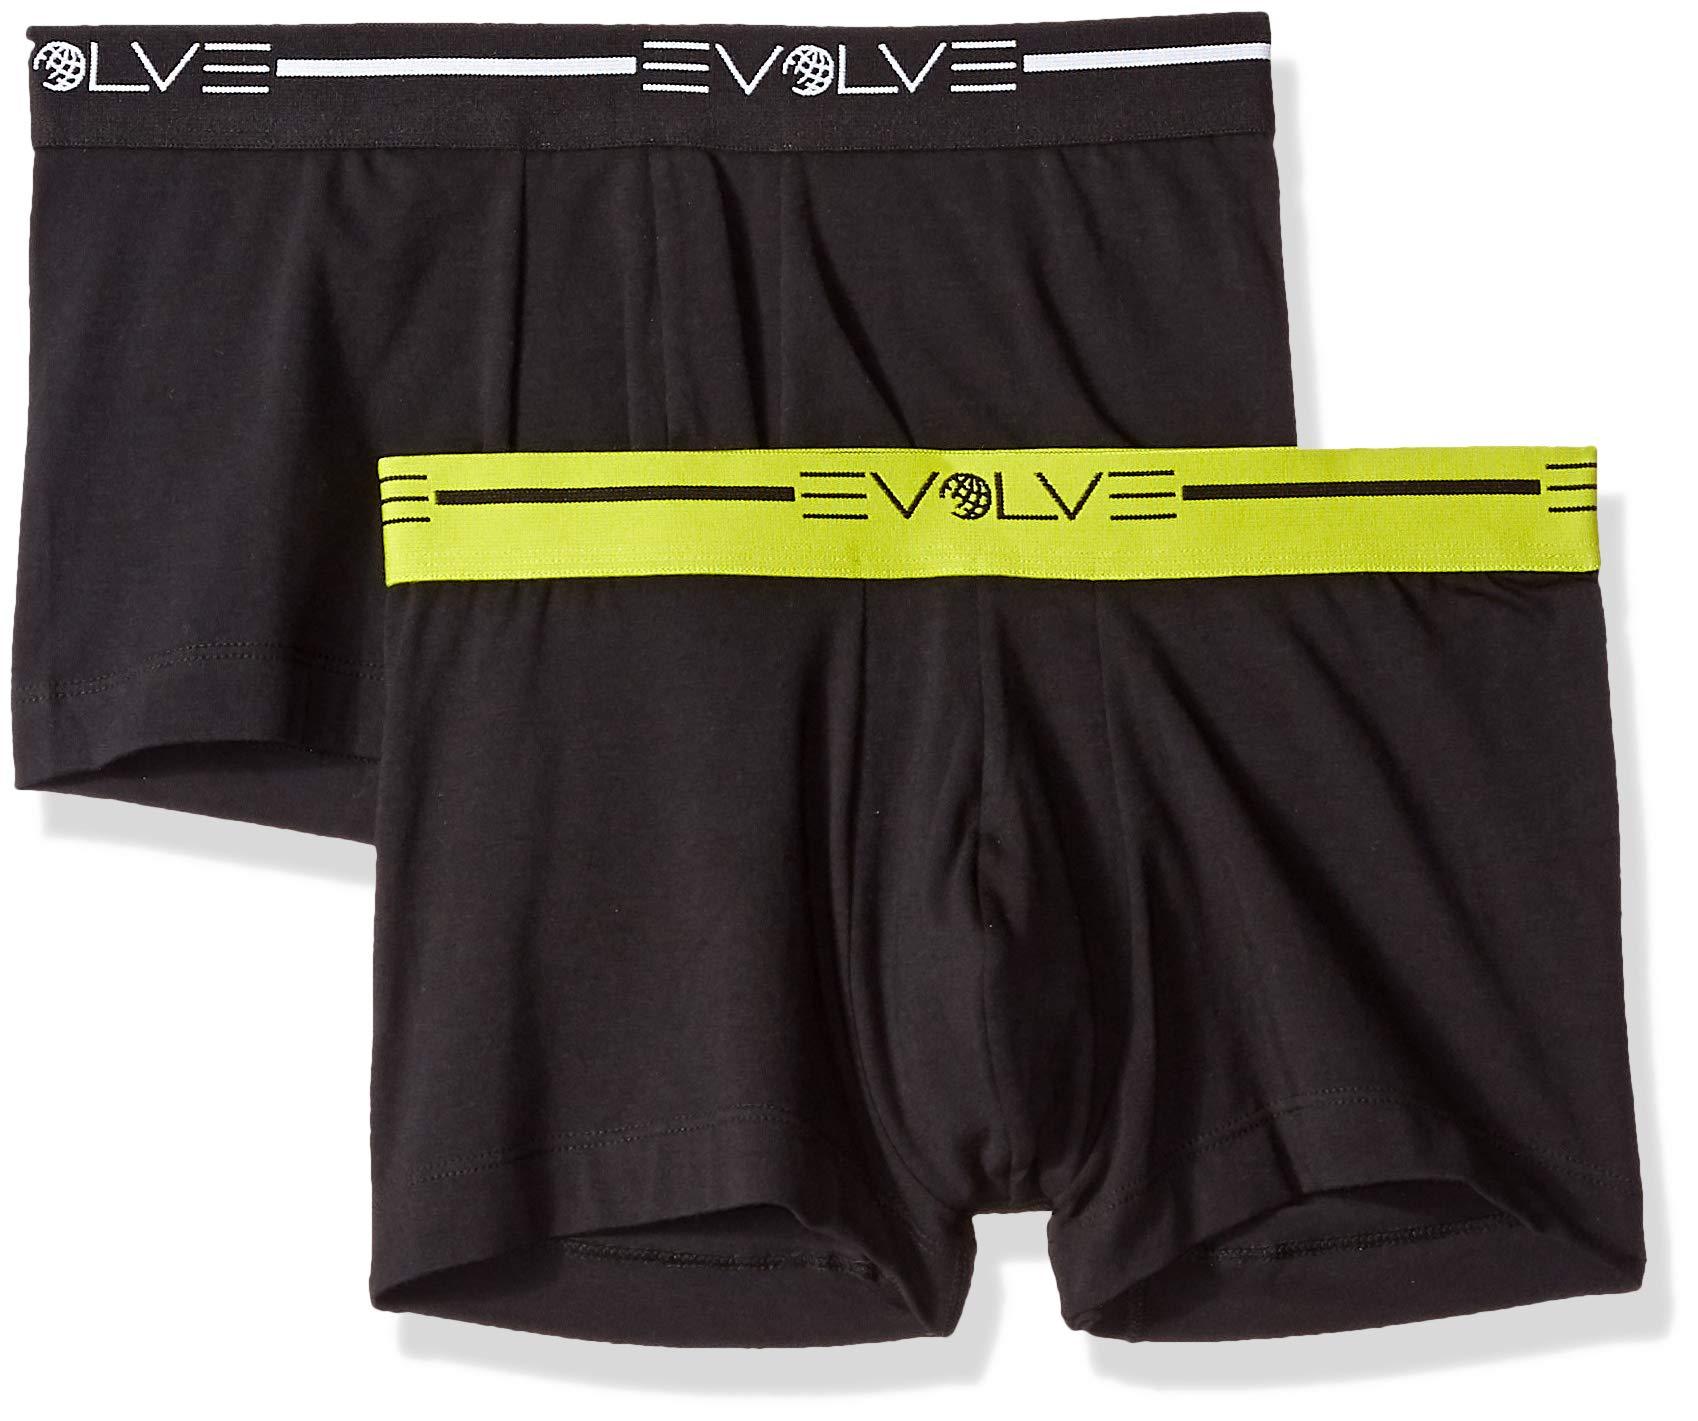 EVOLVE Men's Cotton Stretch No Show Trunk Underwear Multipack, Black, Medium by EVOLVE